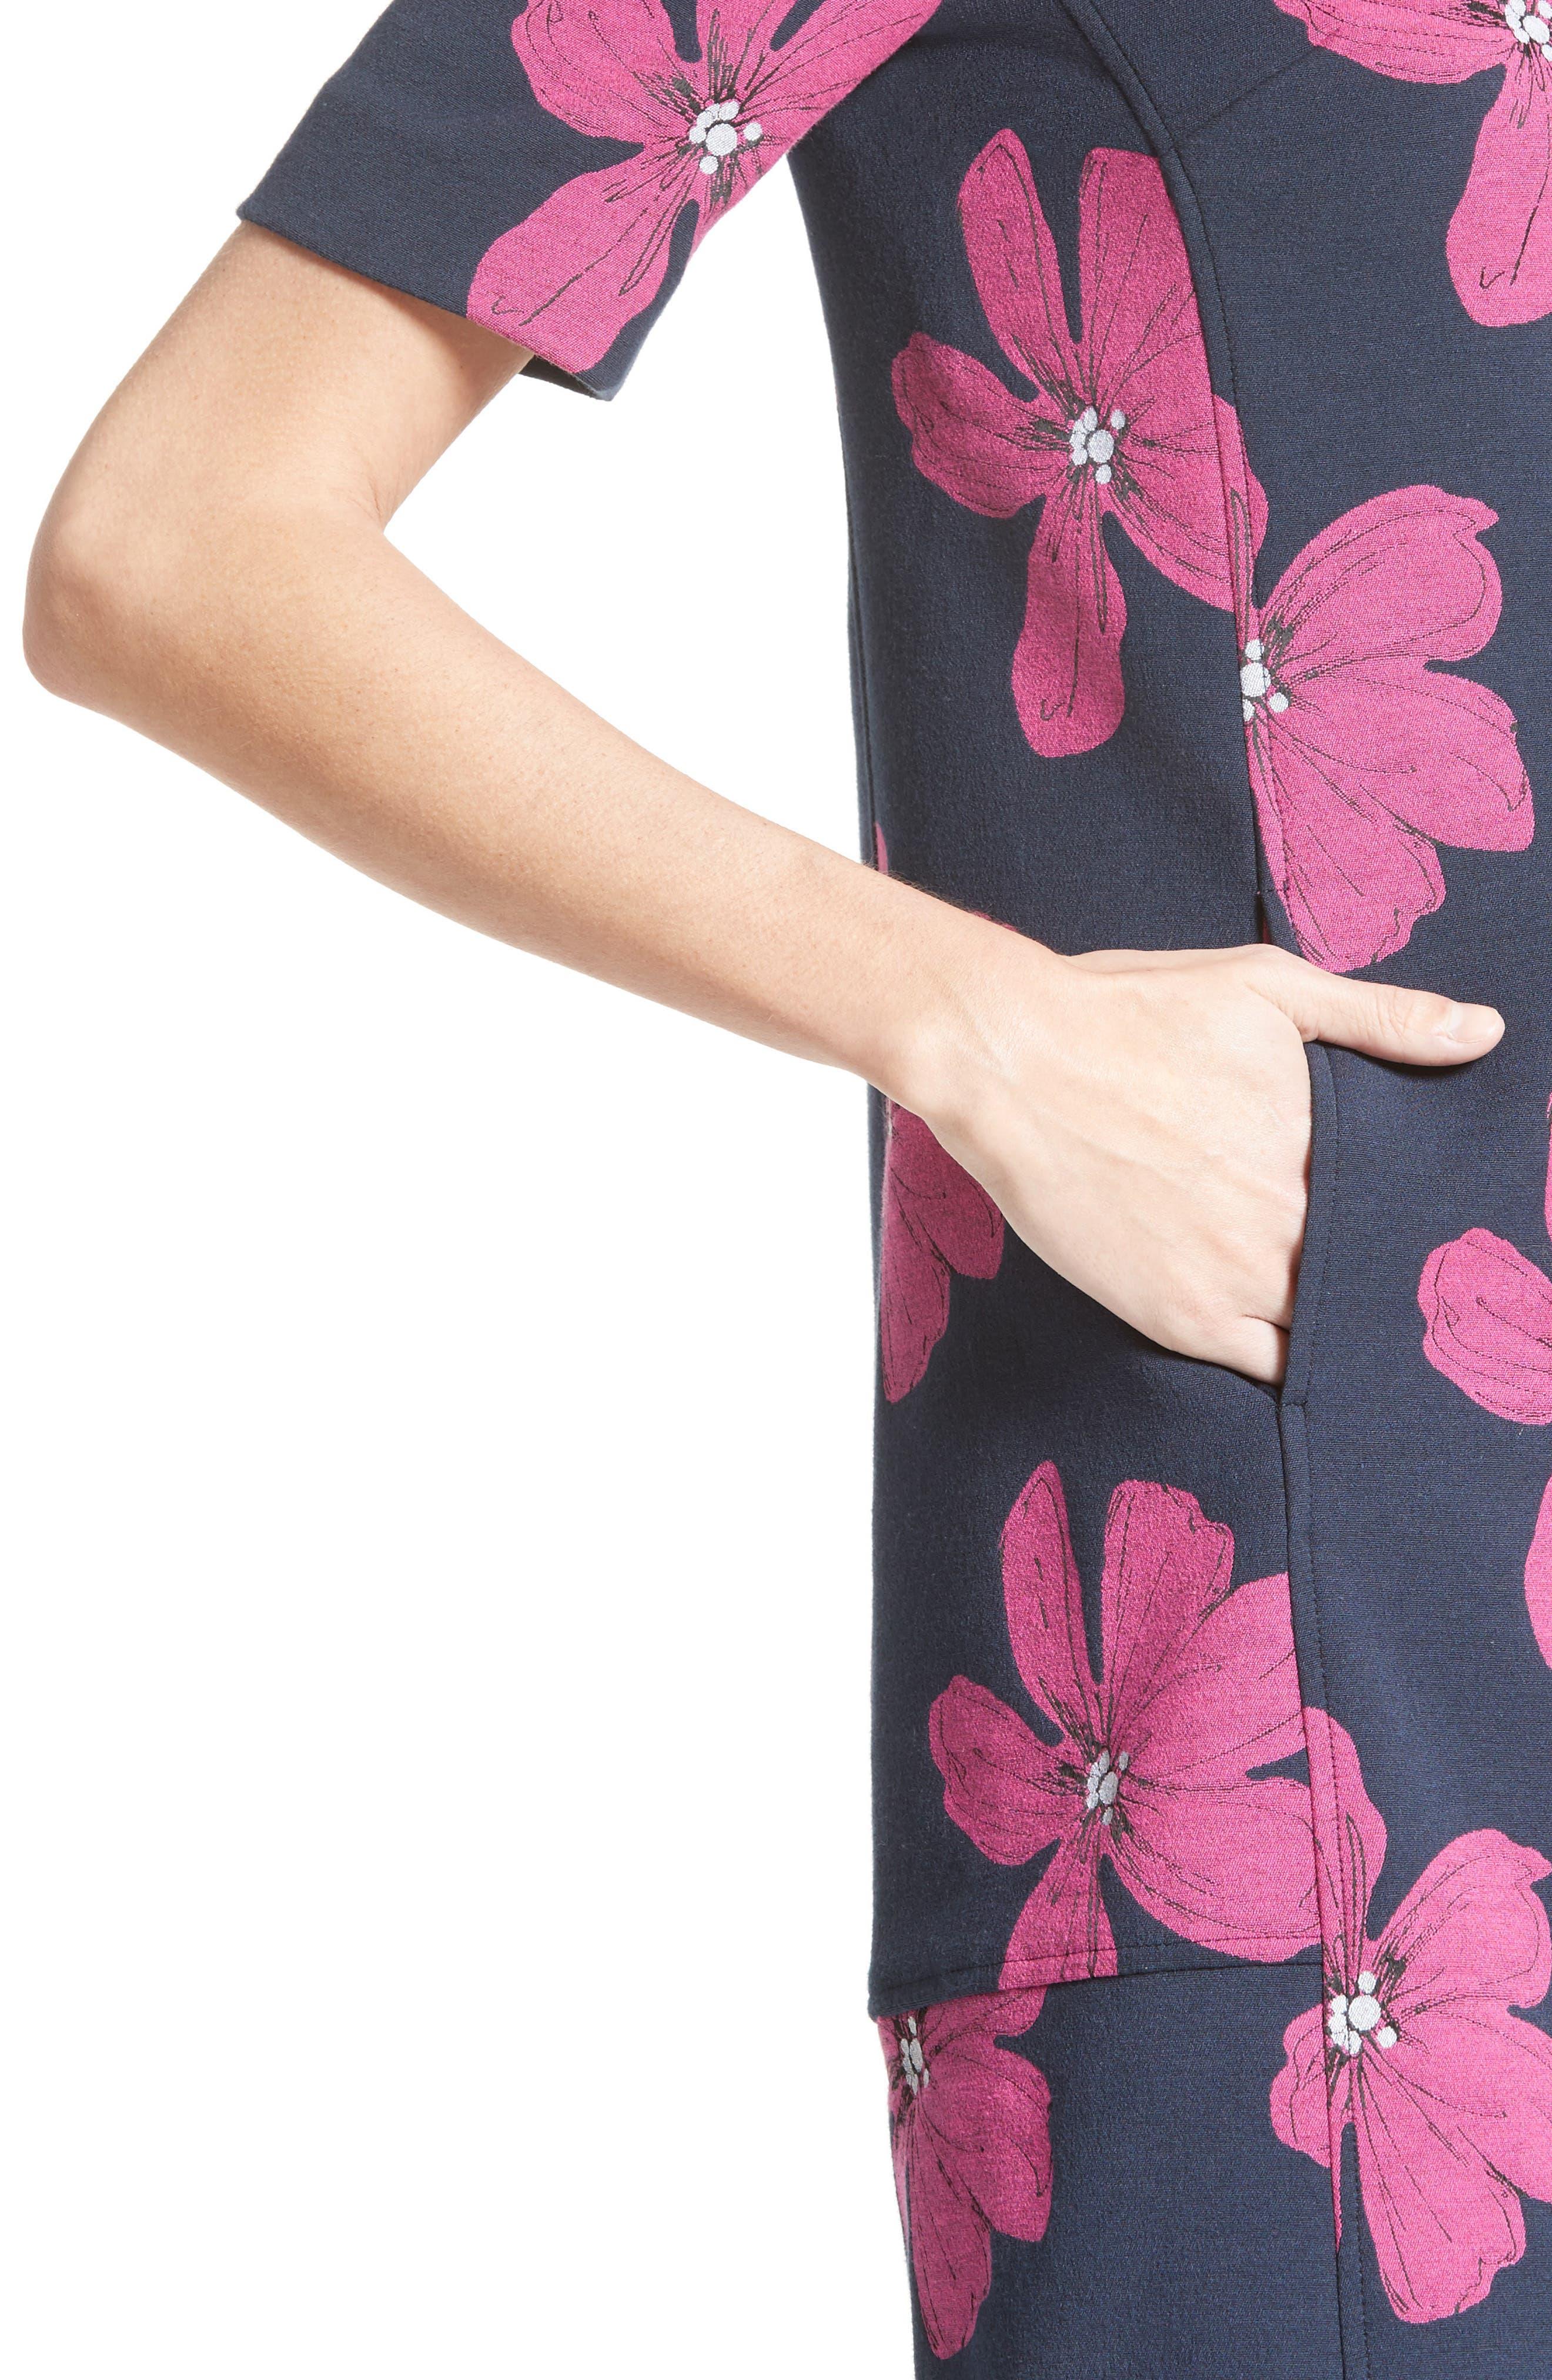 Floral Print Stretch Jacquard Tunic Dress,                             Alternate thumbnail 7, color,                             Navy/ Fuchsia